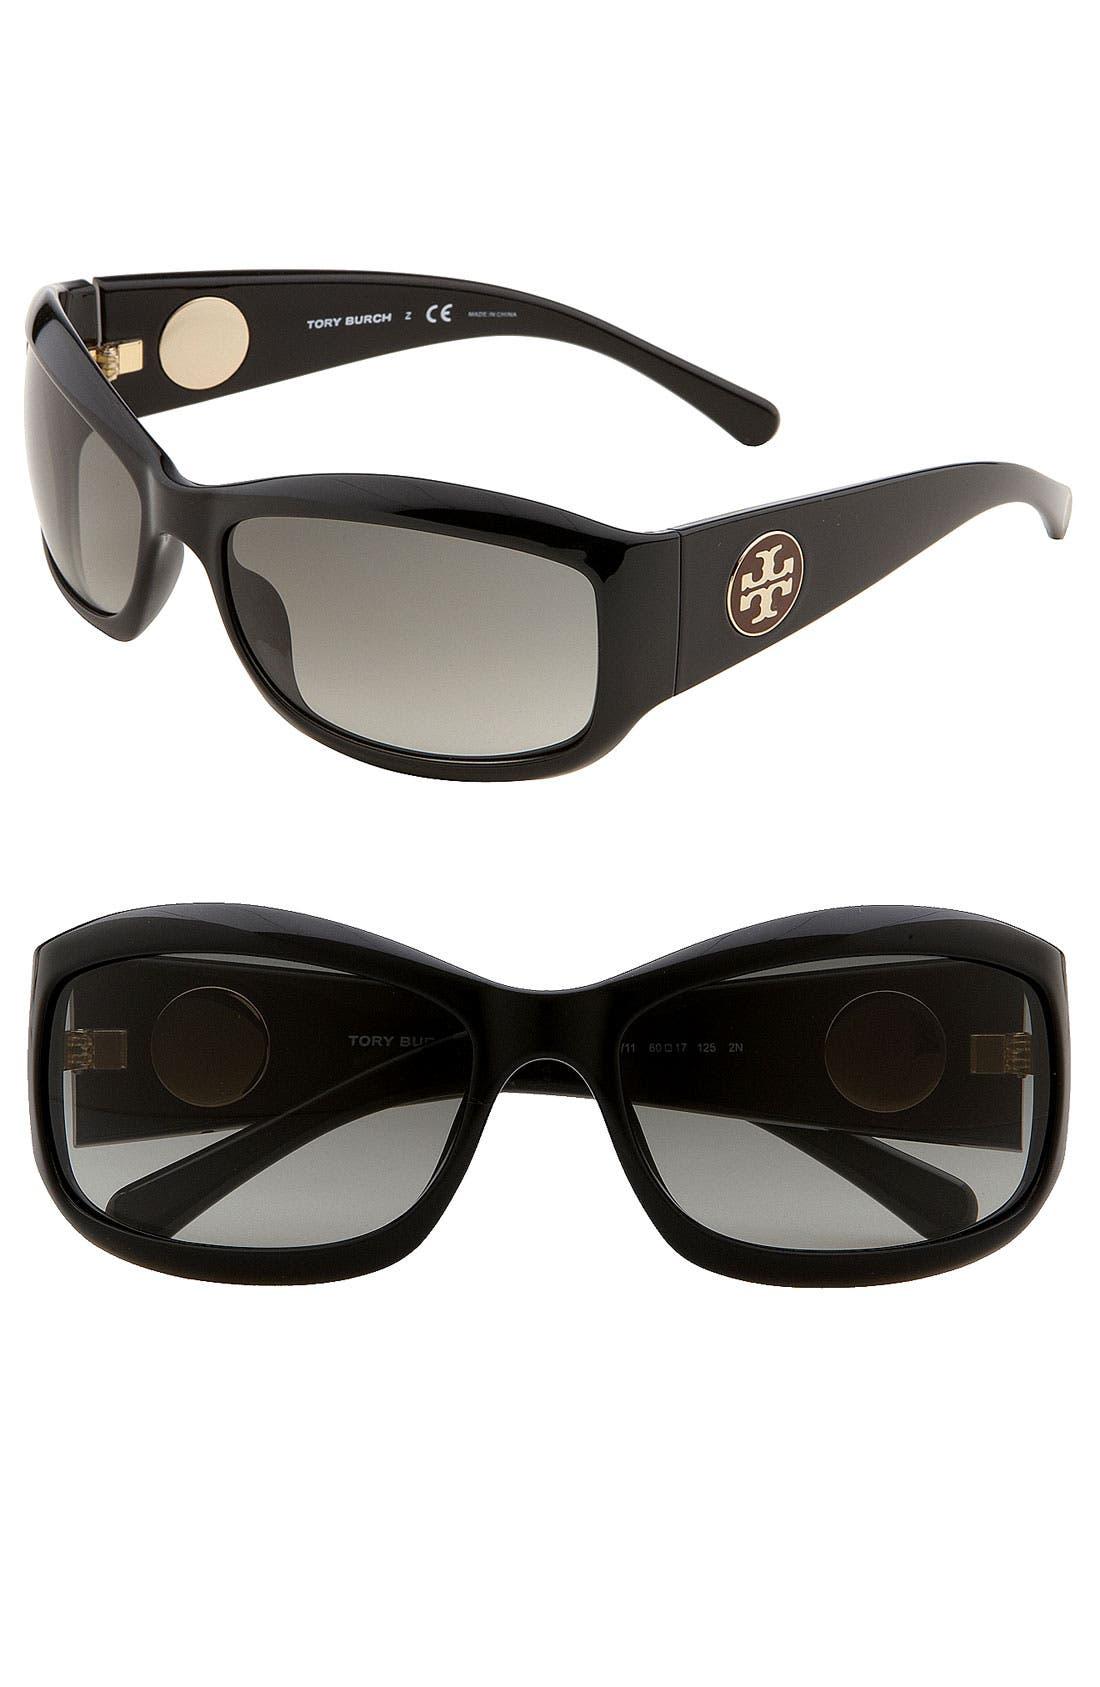 Main Image - Tory Burch 'Pop Out Logo' Wrap Sunglasses